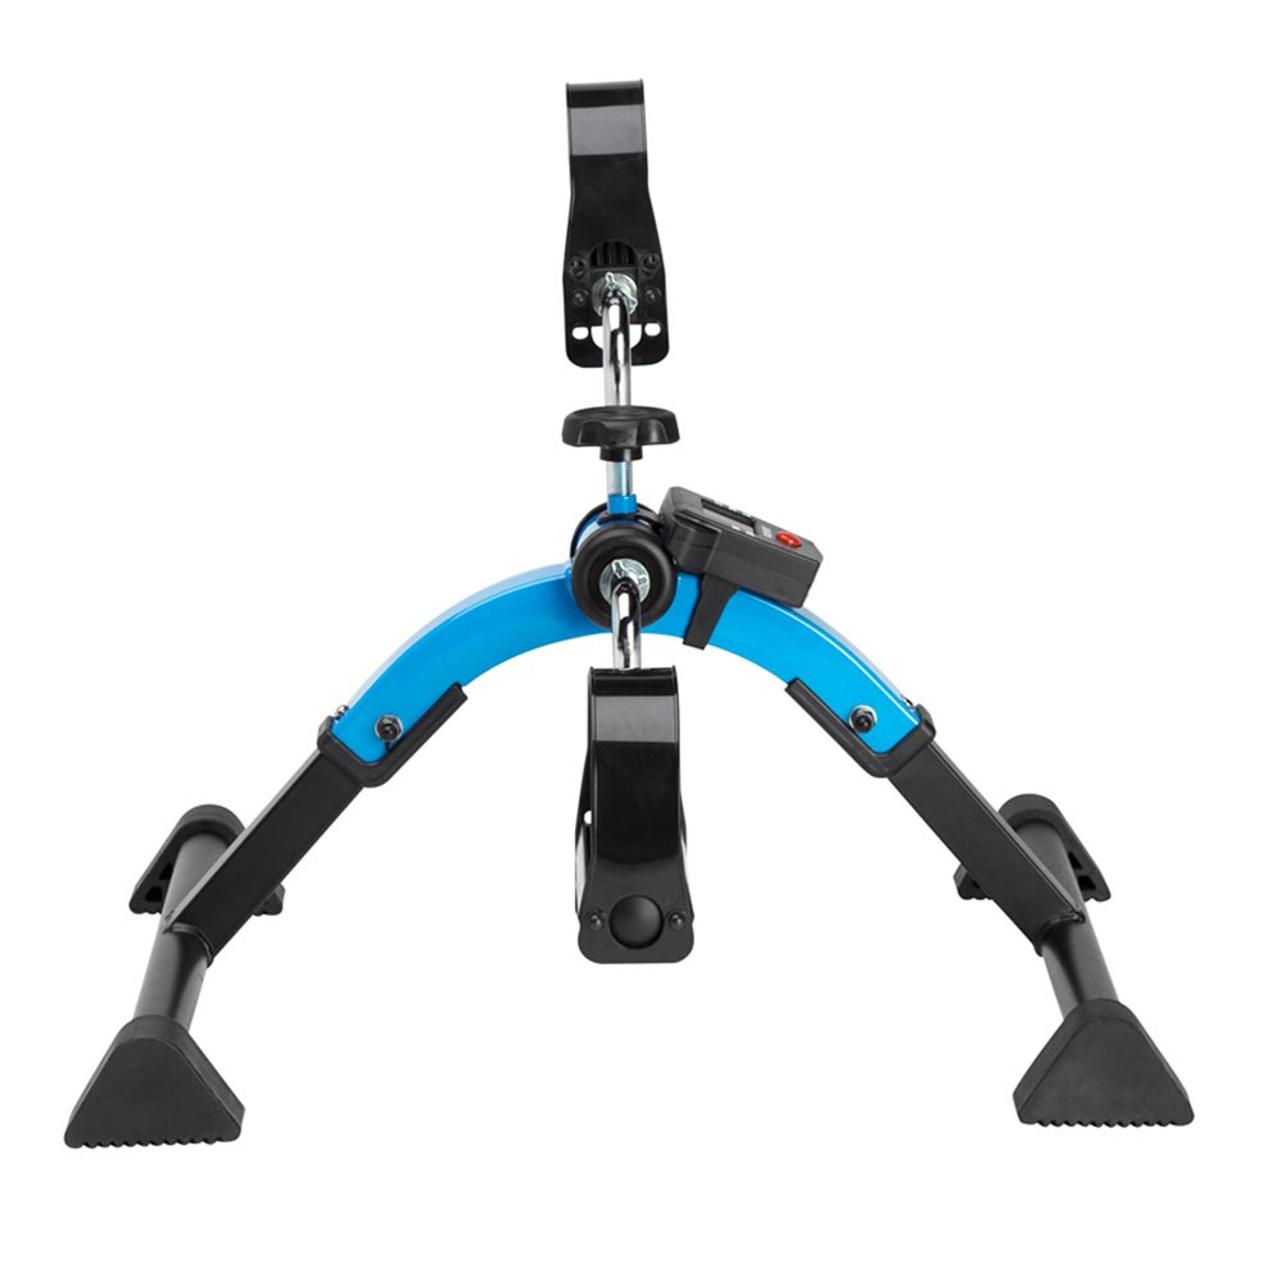 Folding Digital Pedal Exerciser DADPE1 Side